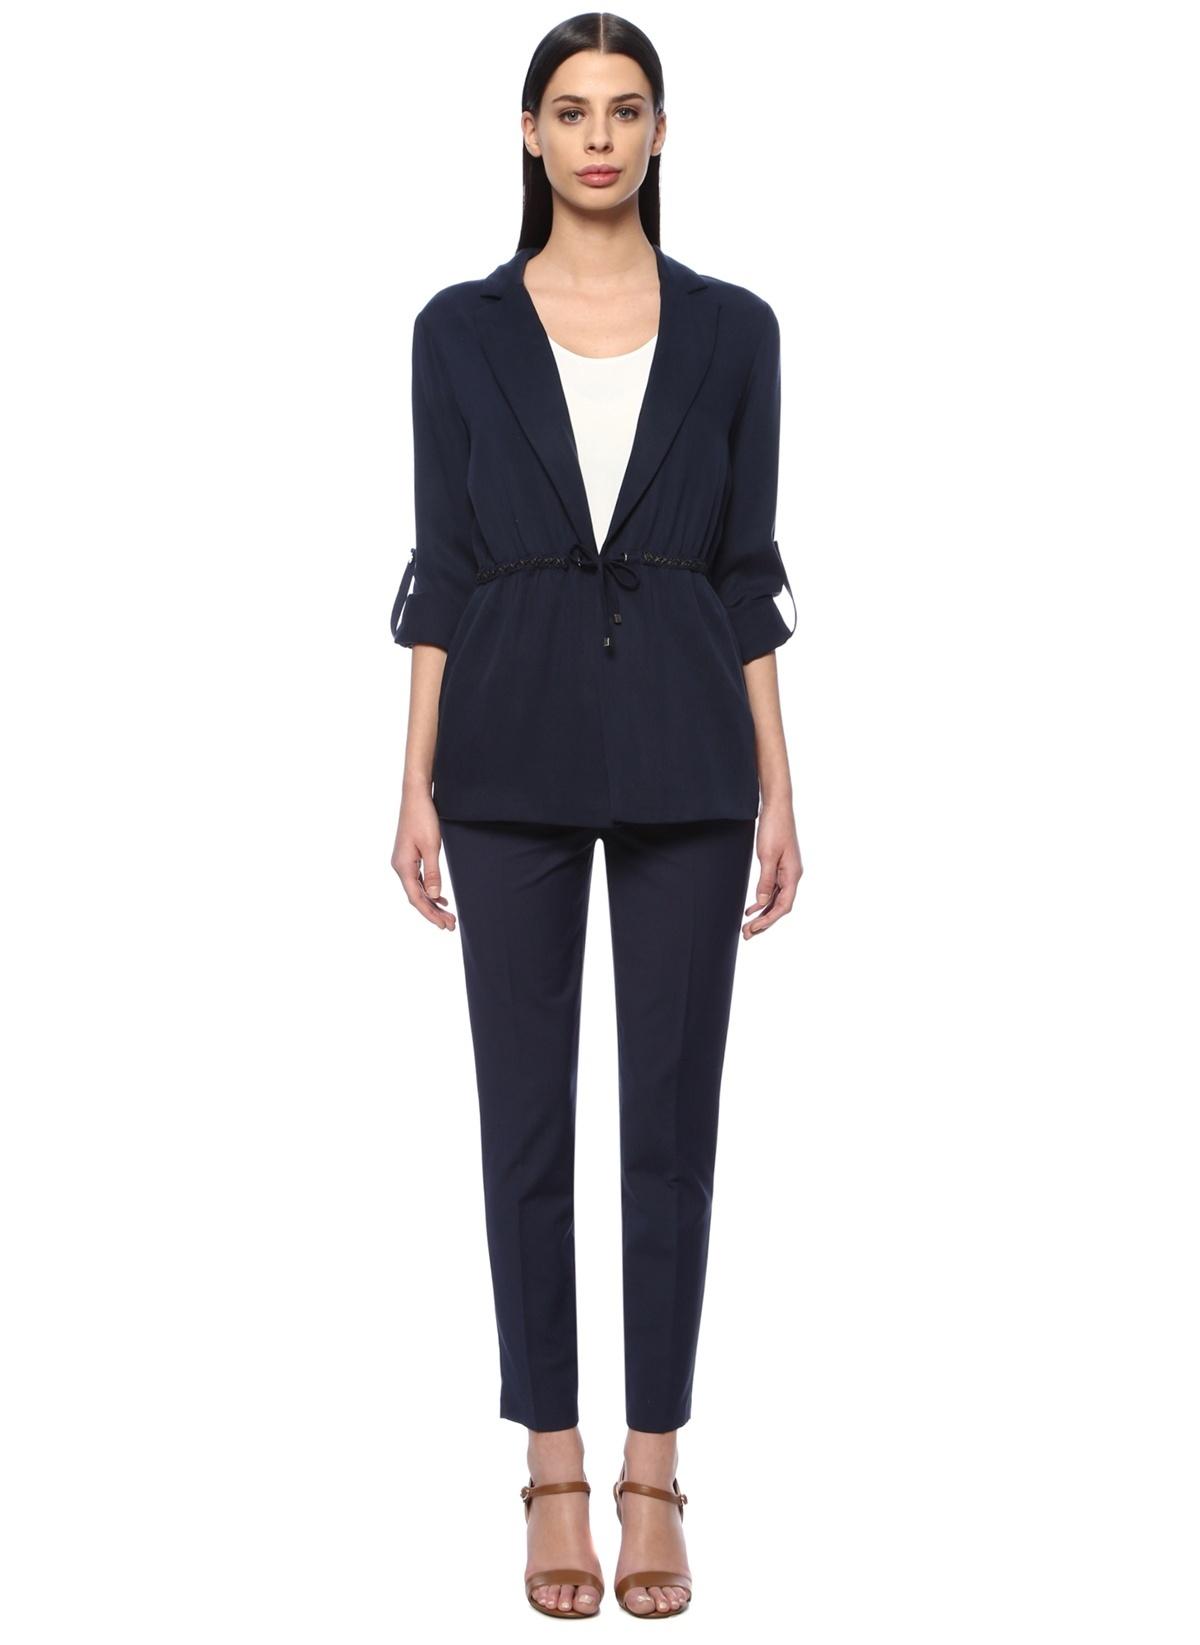 Network Slim Fit Kumaş Pantolon 1068522 K Pantolon – 321.3 TL